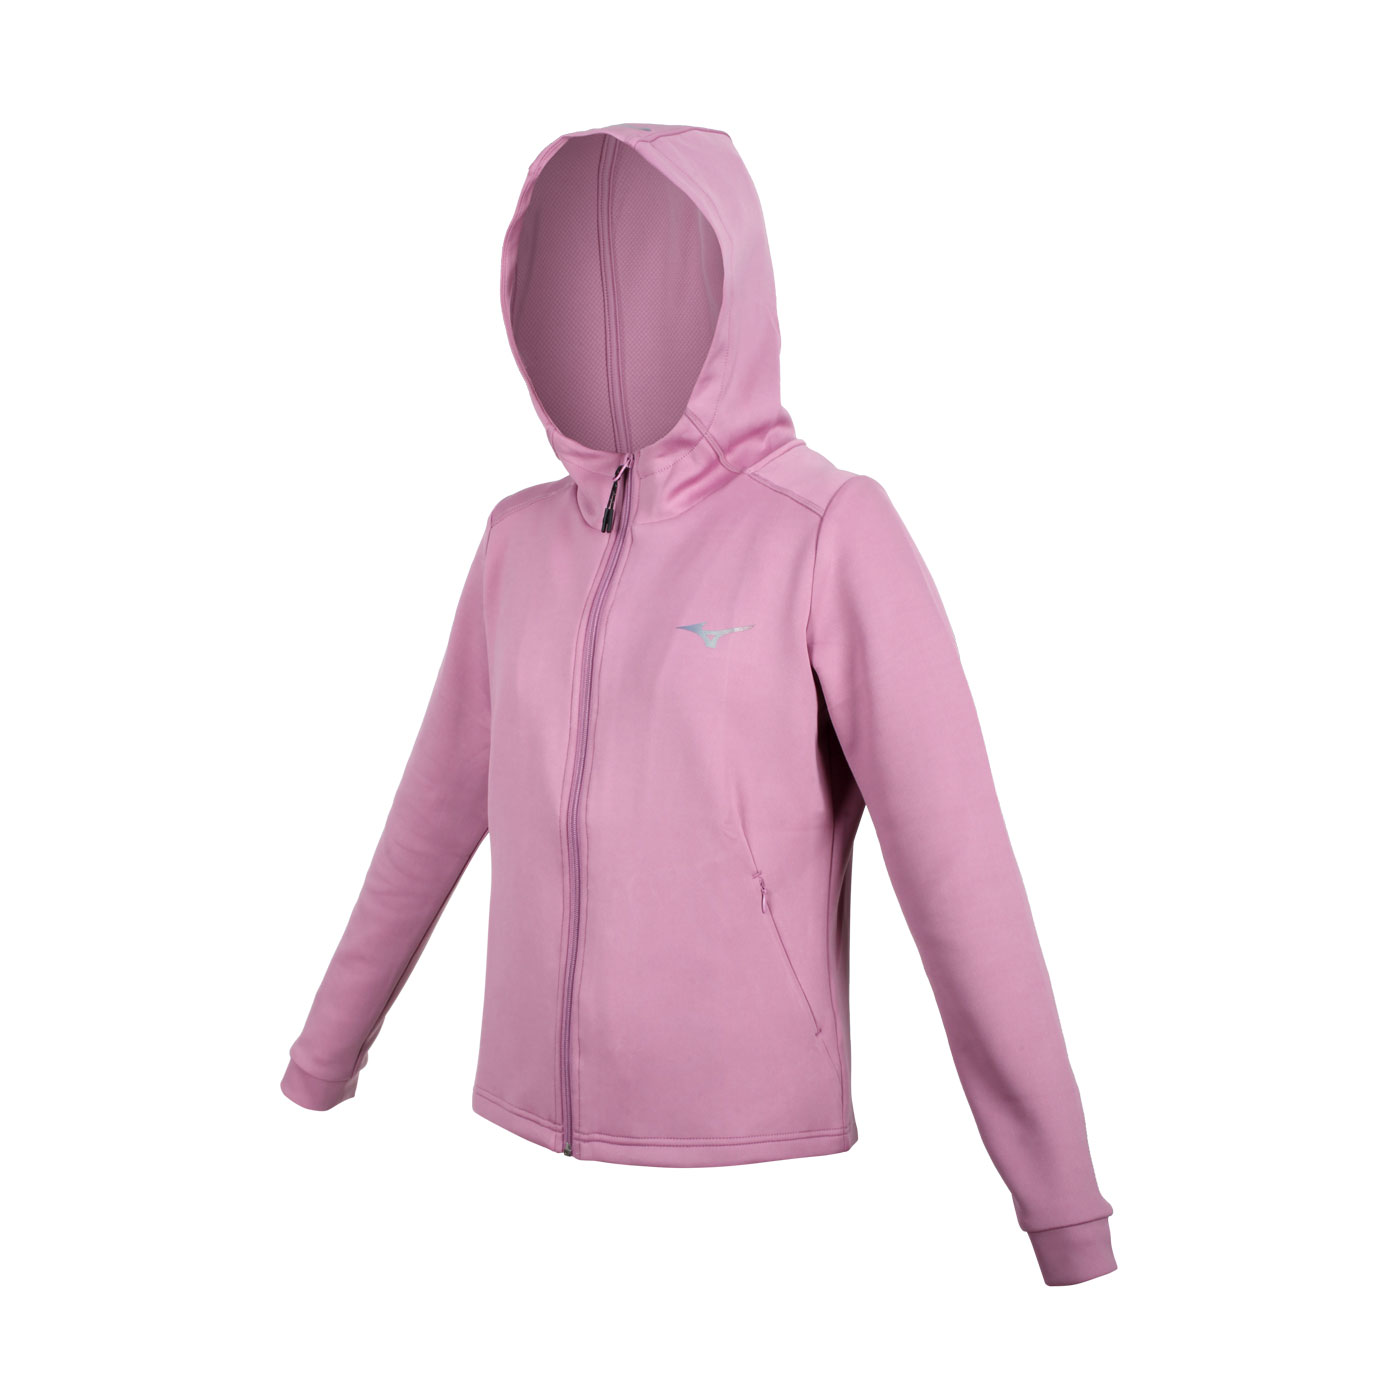 MIZUNO 女款針織外套 32TC128366 - 藕紫銀